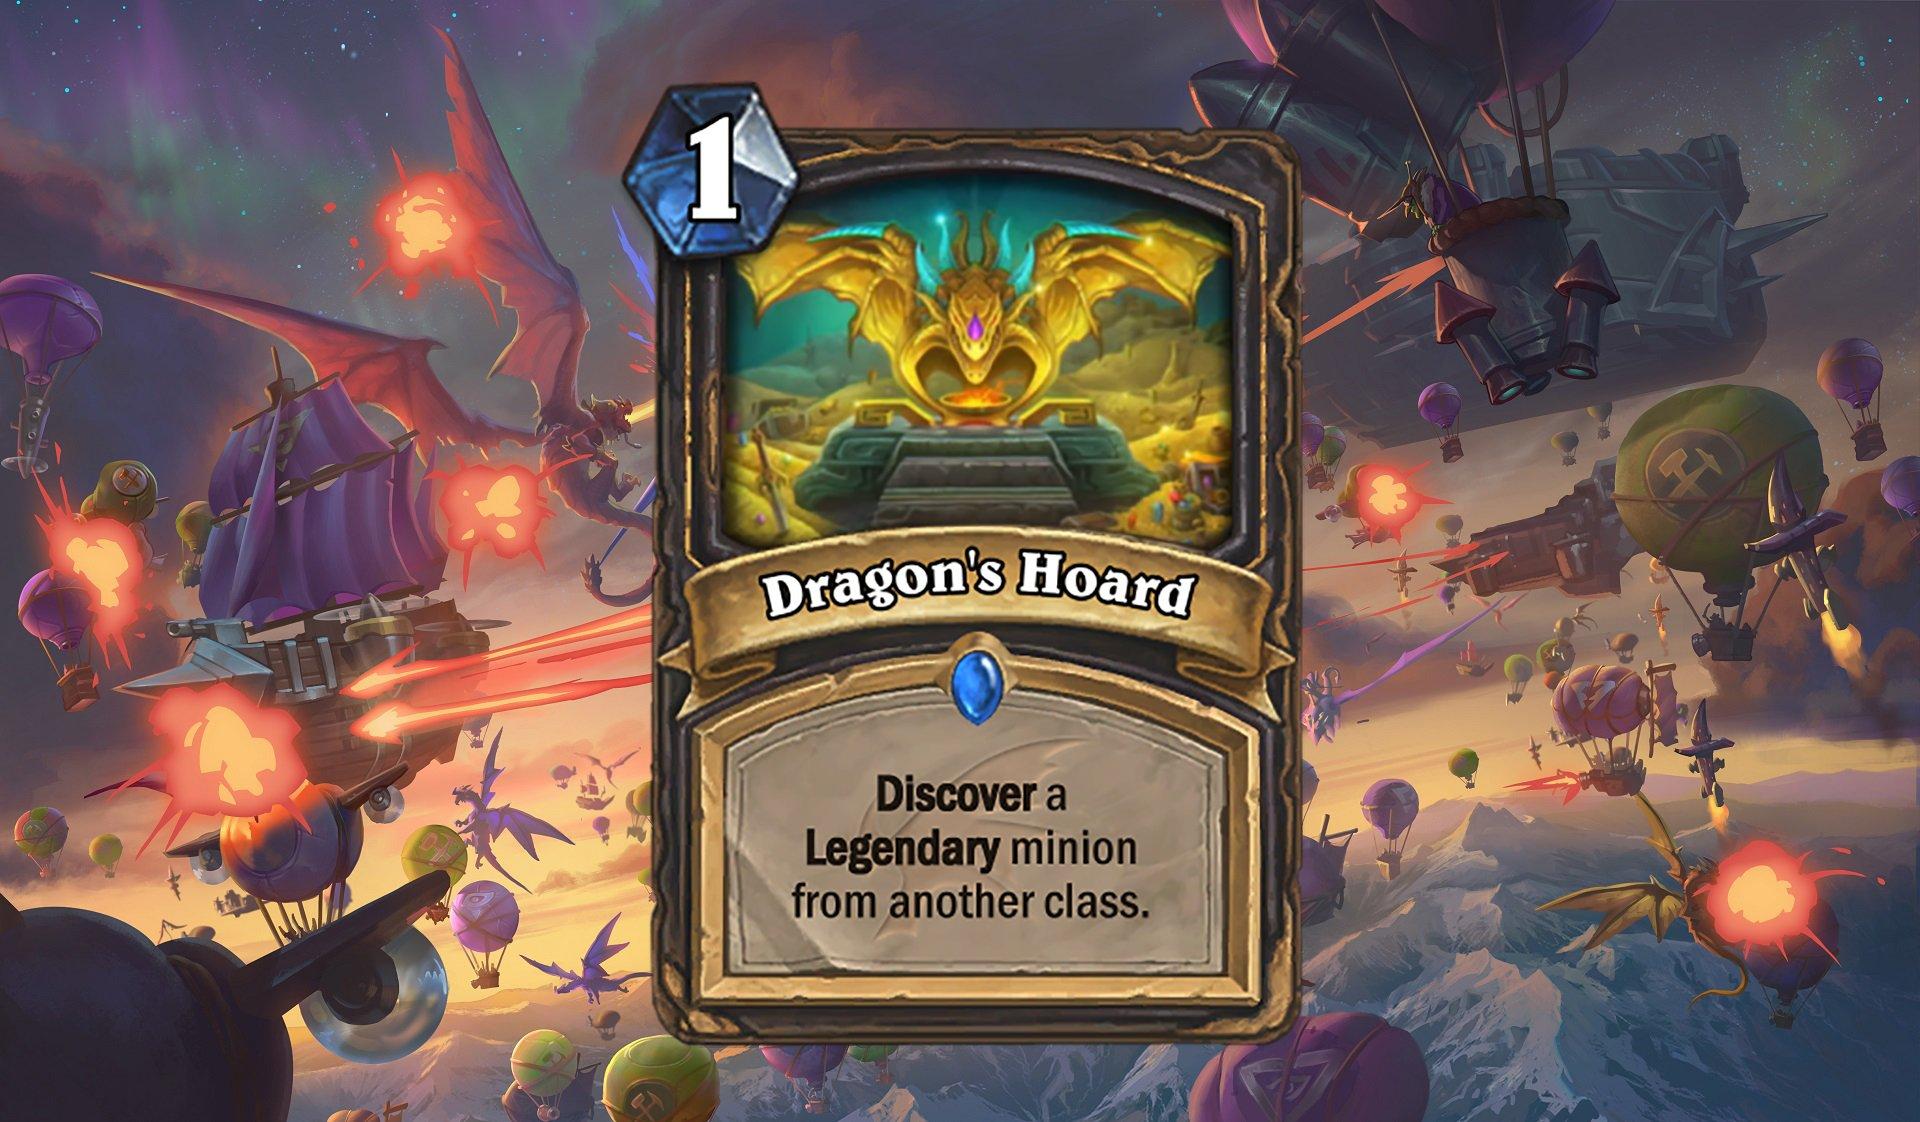 Hearthstone - Dragon's Hoard